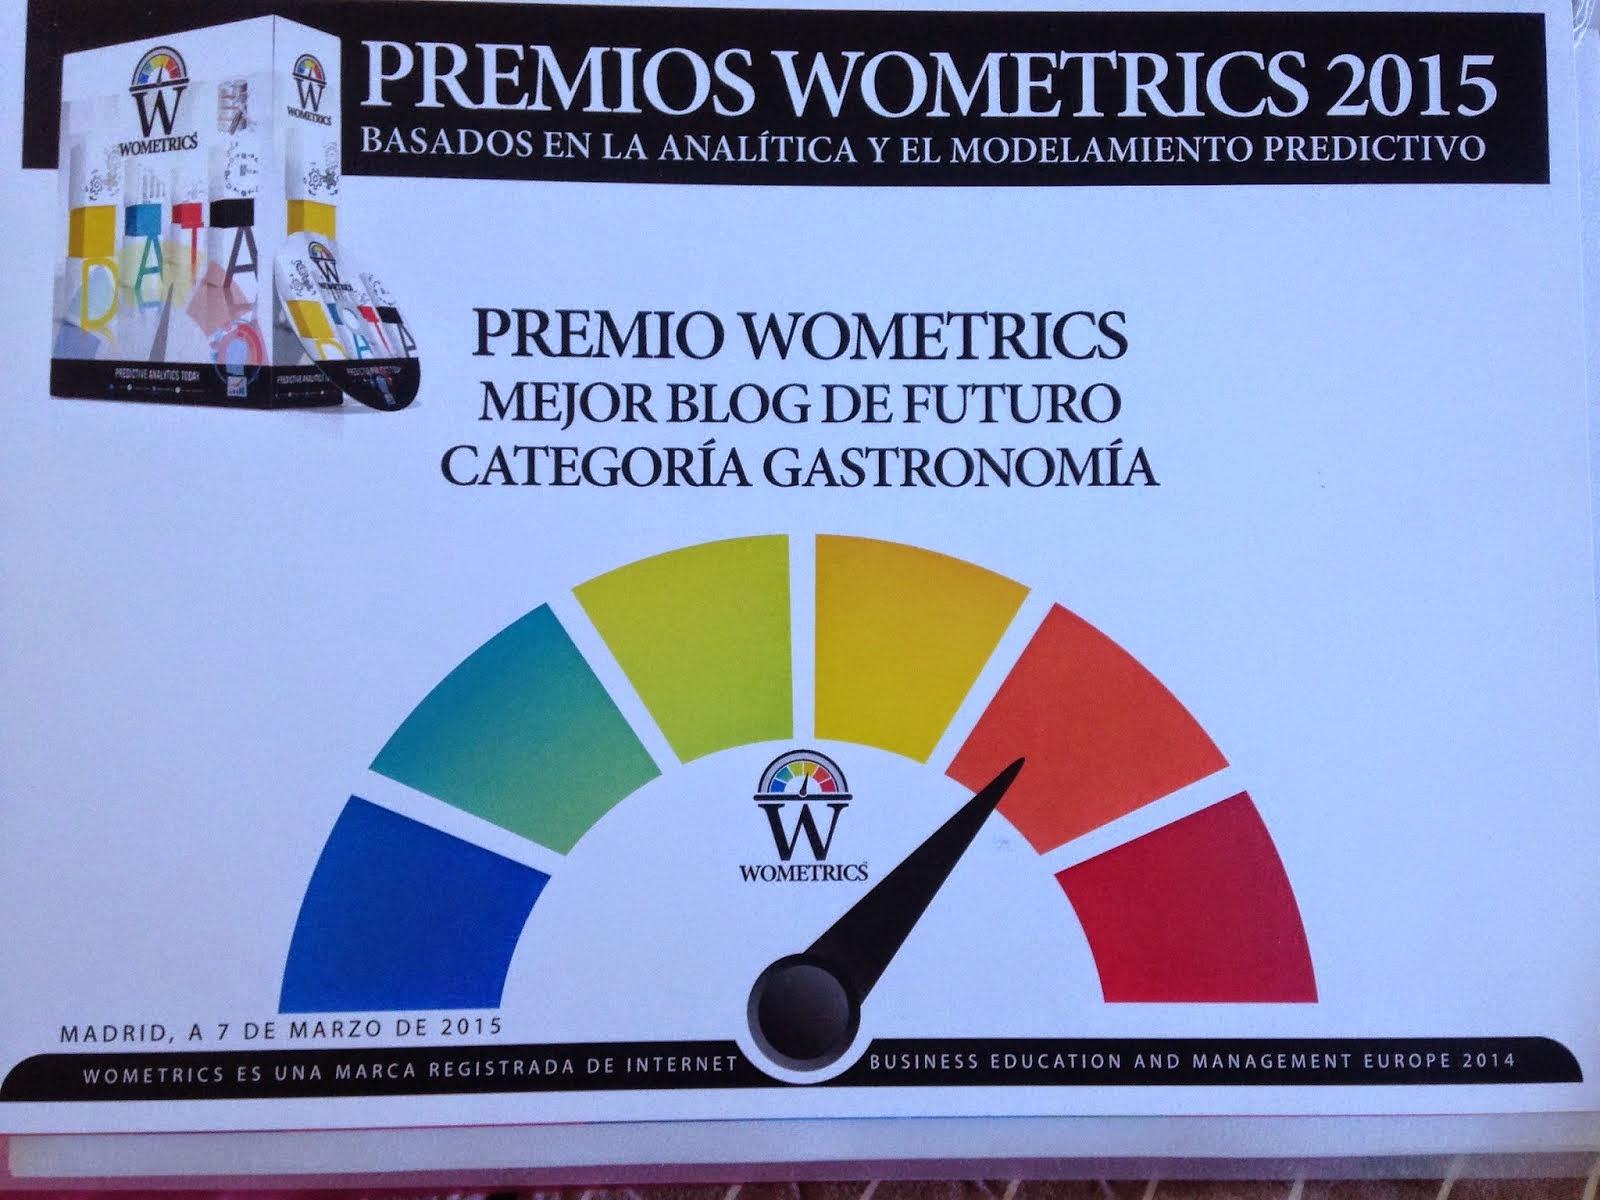 1º Premio Wometrics 2015, @Alefeldman